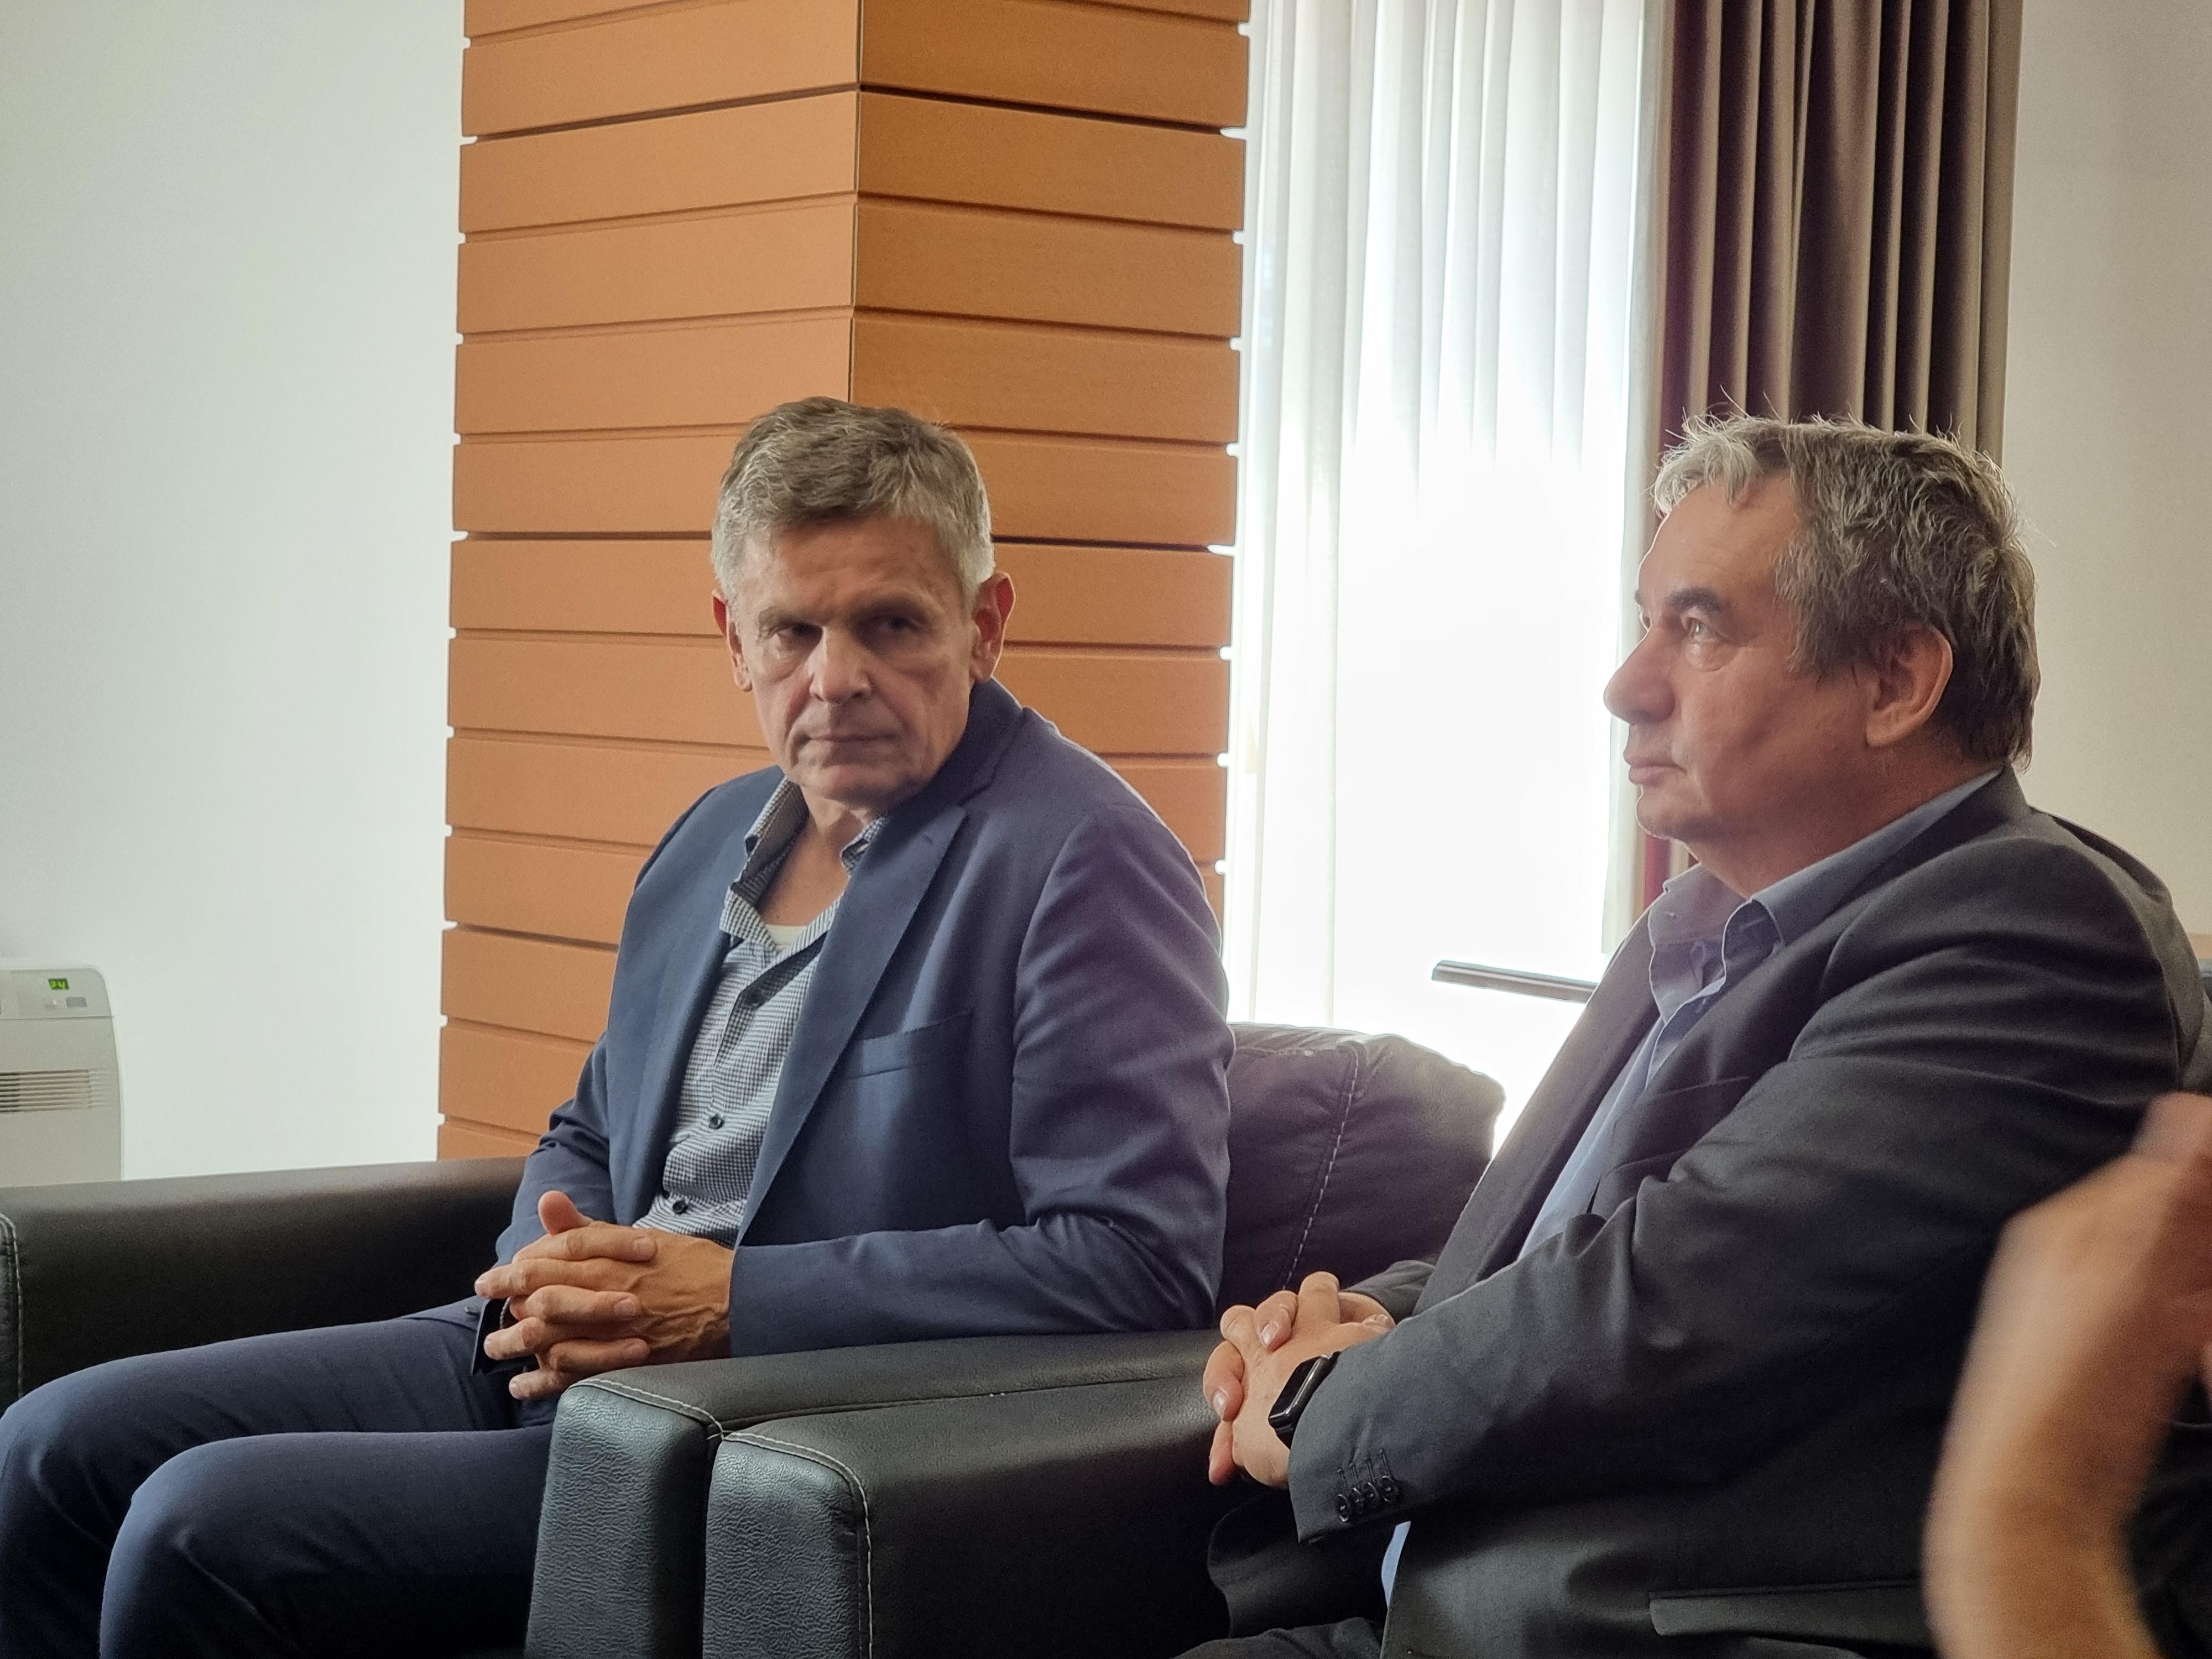 Kryebashkiaku Xhakolli pret në takim z. Gieger dhe z. Kandt